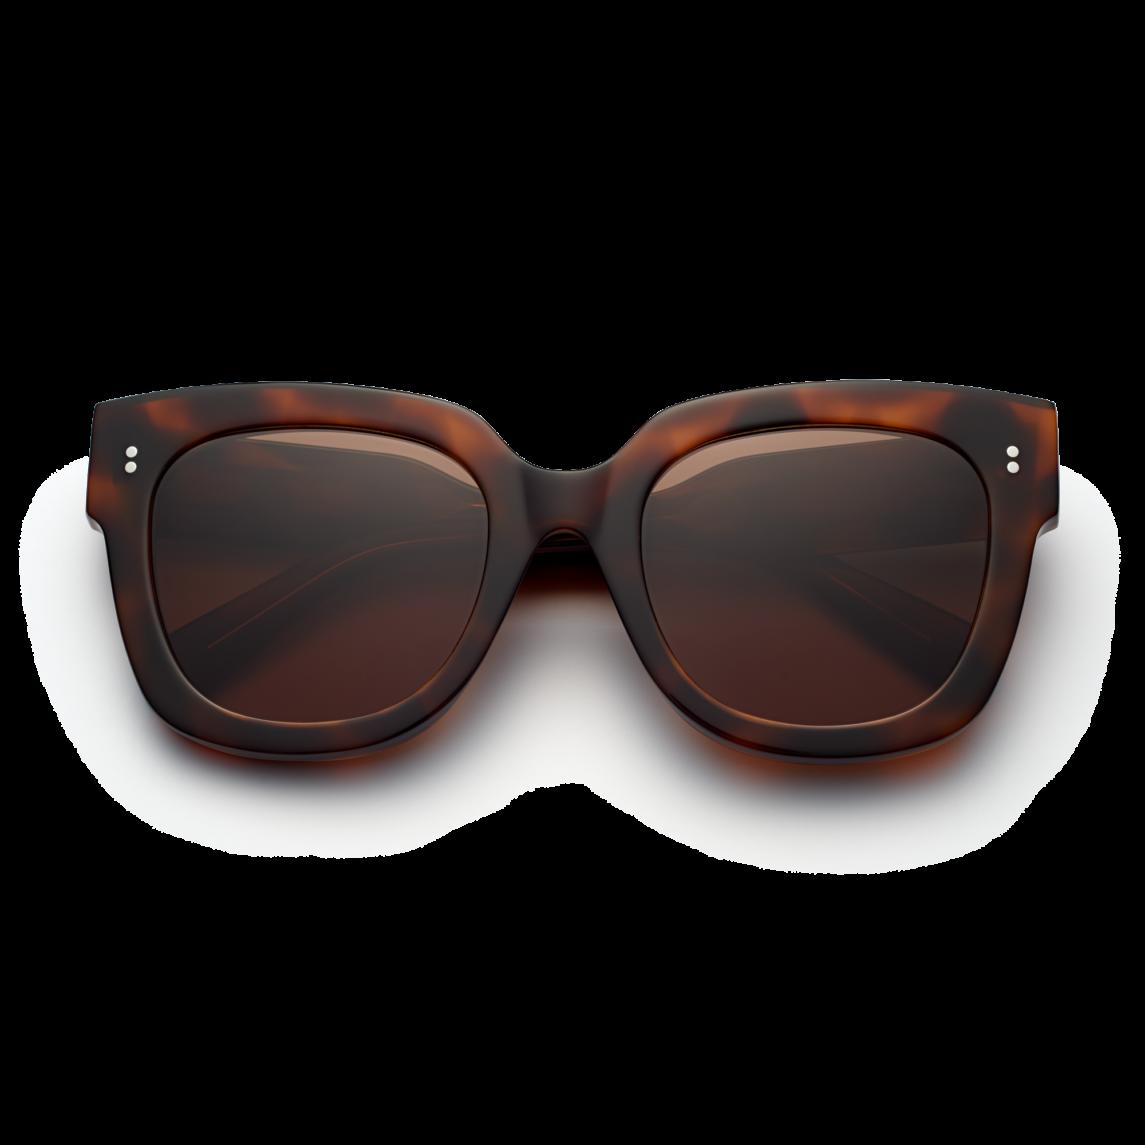 Chimi Tortoise #008 Sunglasses with Black Lenses